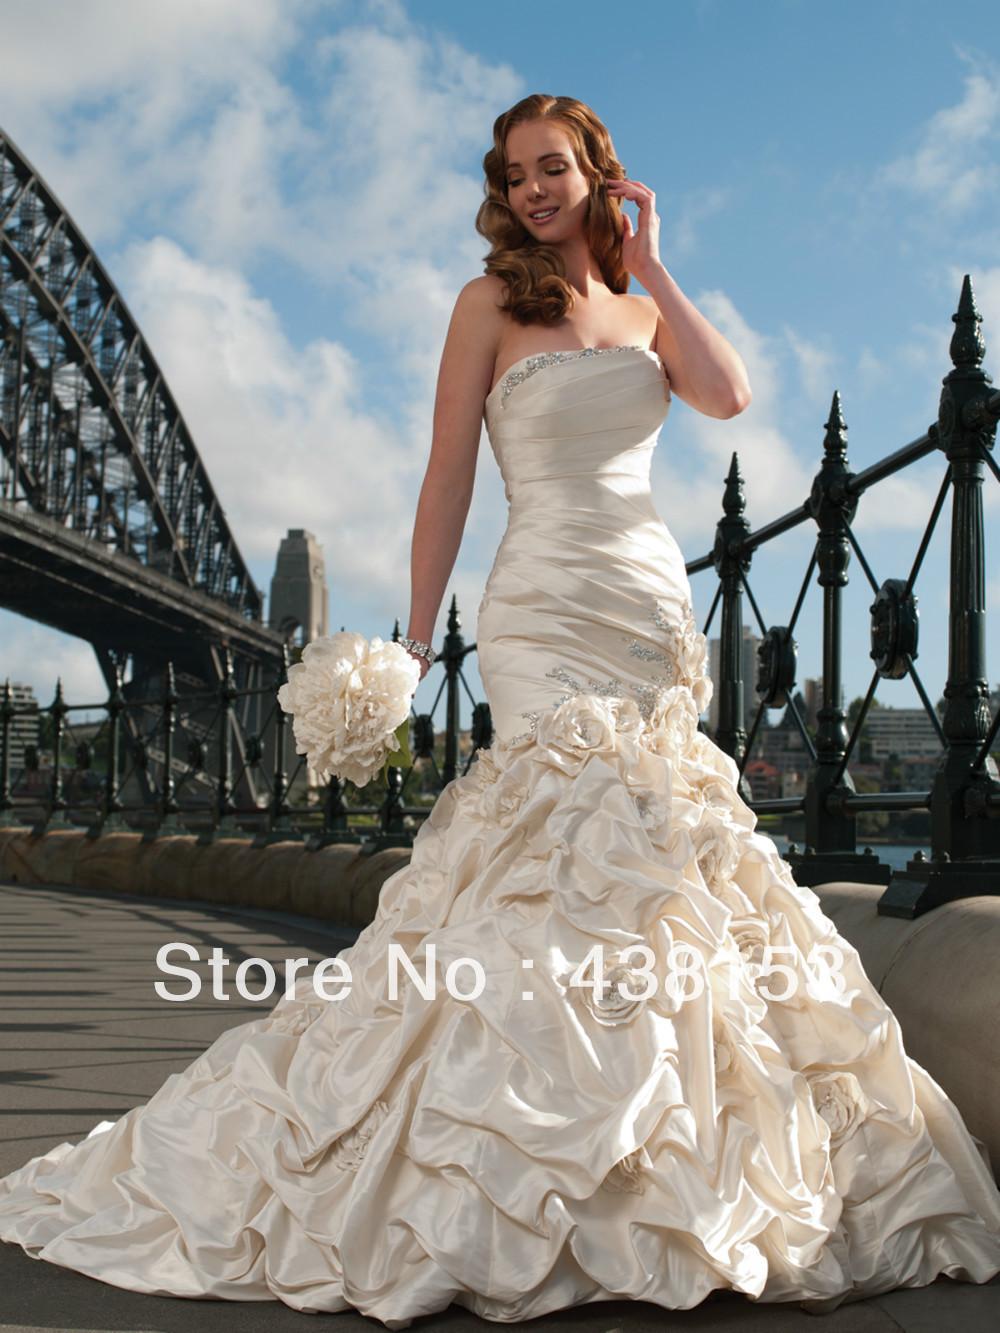 2015Fancy Strapless Sexy Ruffles Crystals Flowers Taffeta Free Shipping New Design 2015 Bridal Dress Mermaid(China (Mainland))